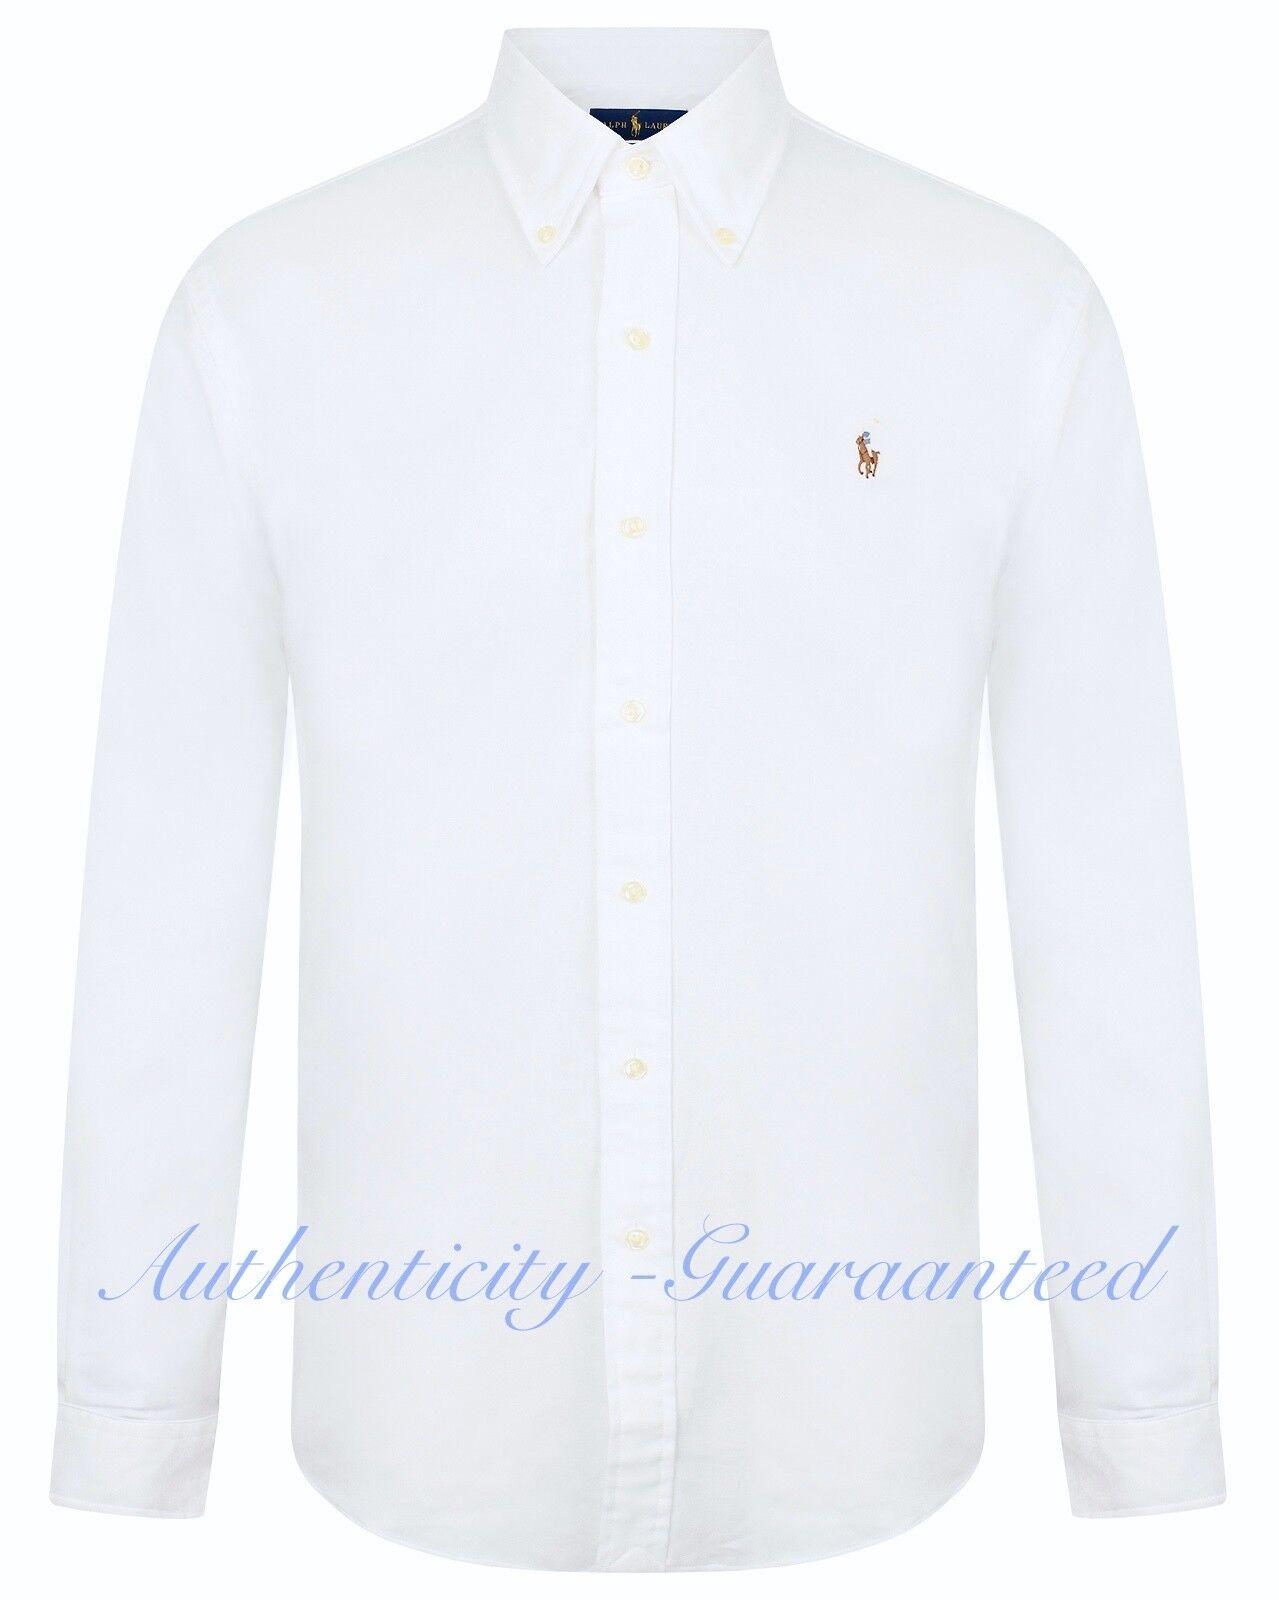 Ralph Lauren Slim Fit Stretch Oxford Cotton Shirt White S-XXL RRP